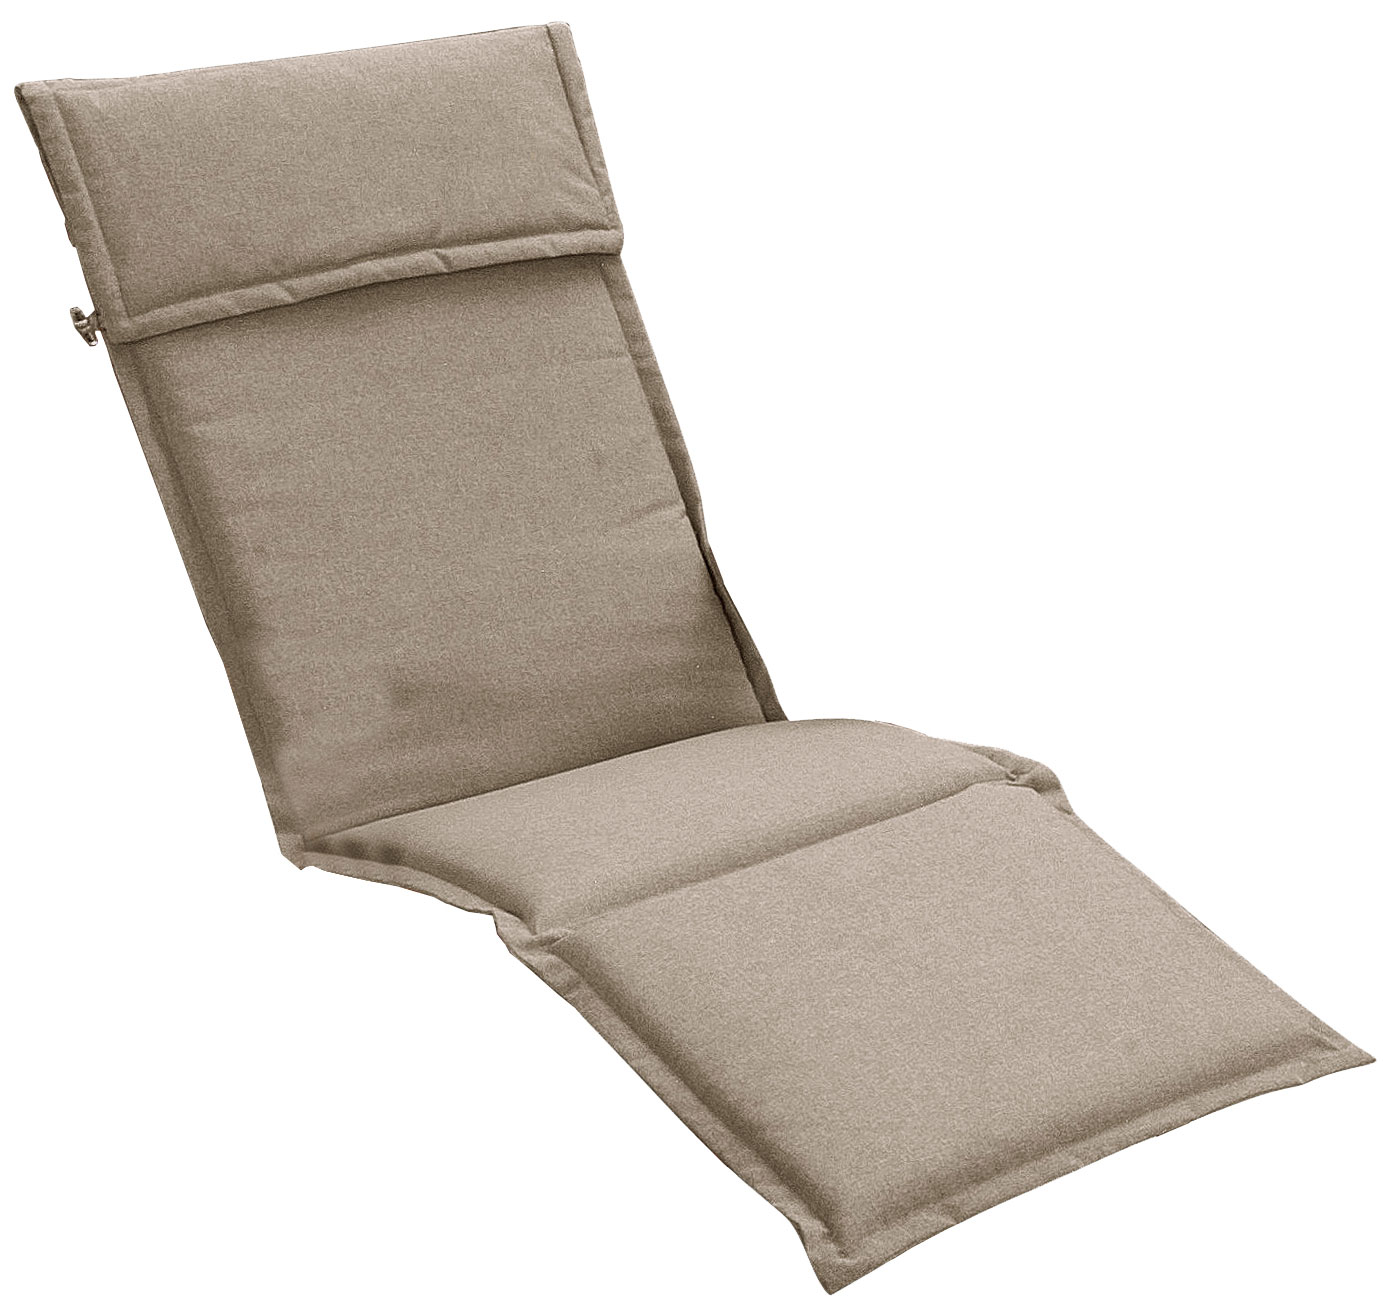 Cuscino per deckchair 184x46 cm con volant SABBIA